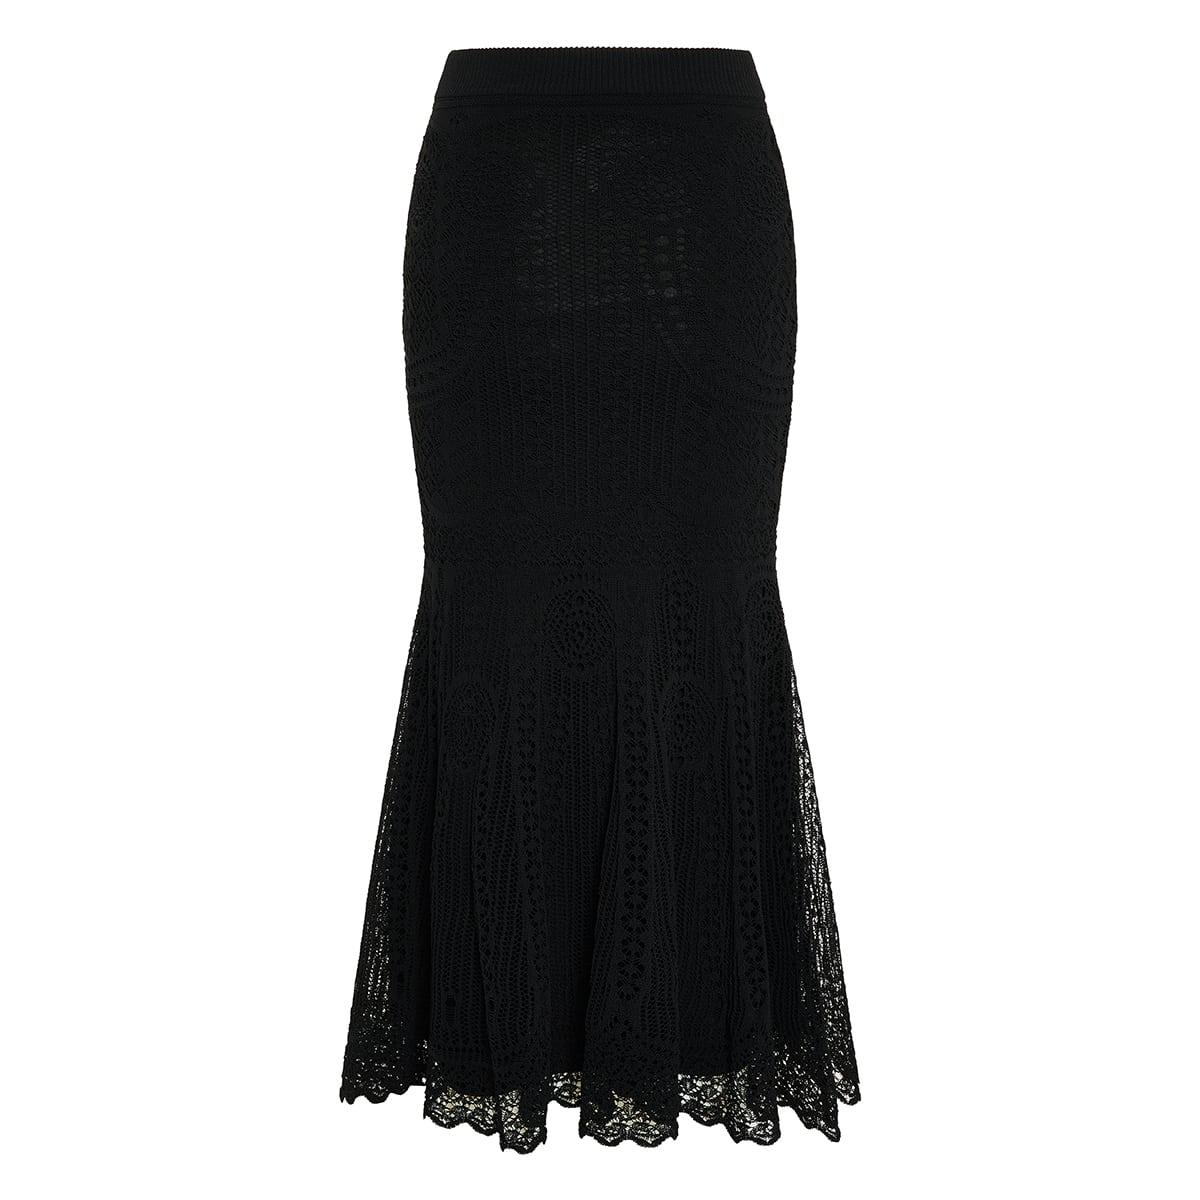 Crochet-knit flounce midi skirt